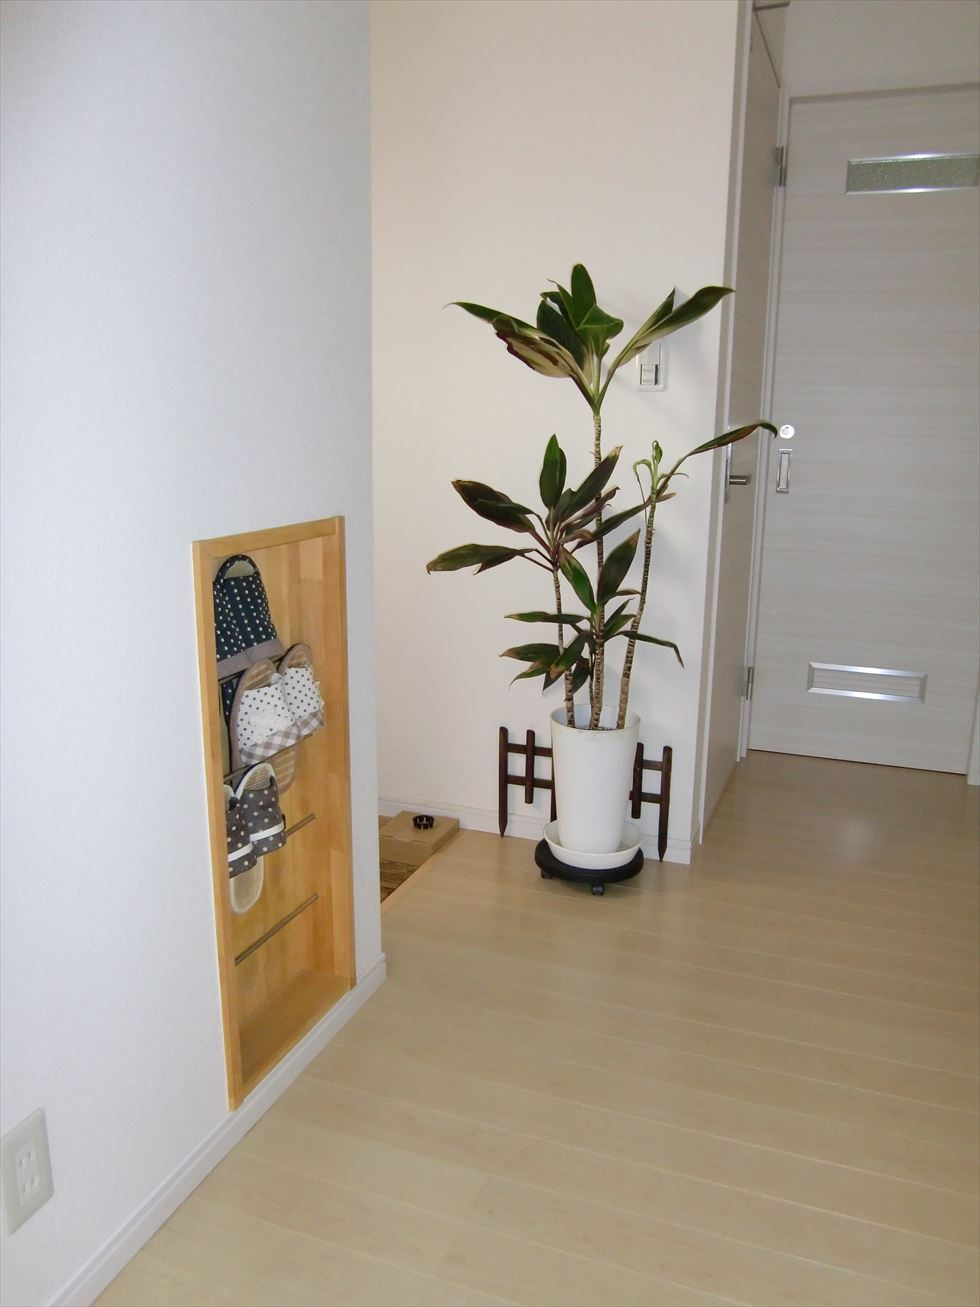 03-room35.jpg